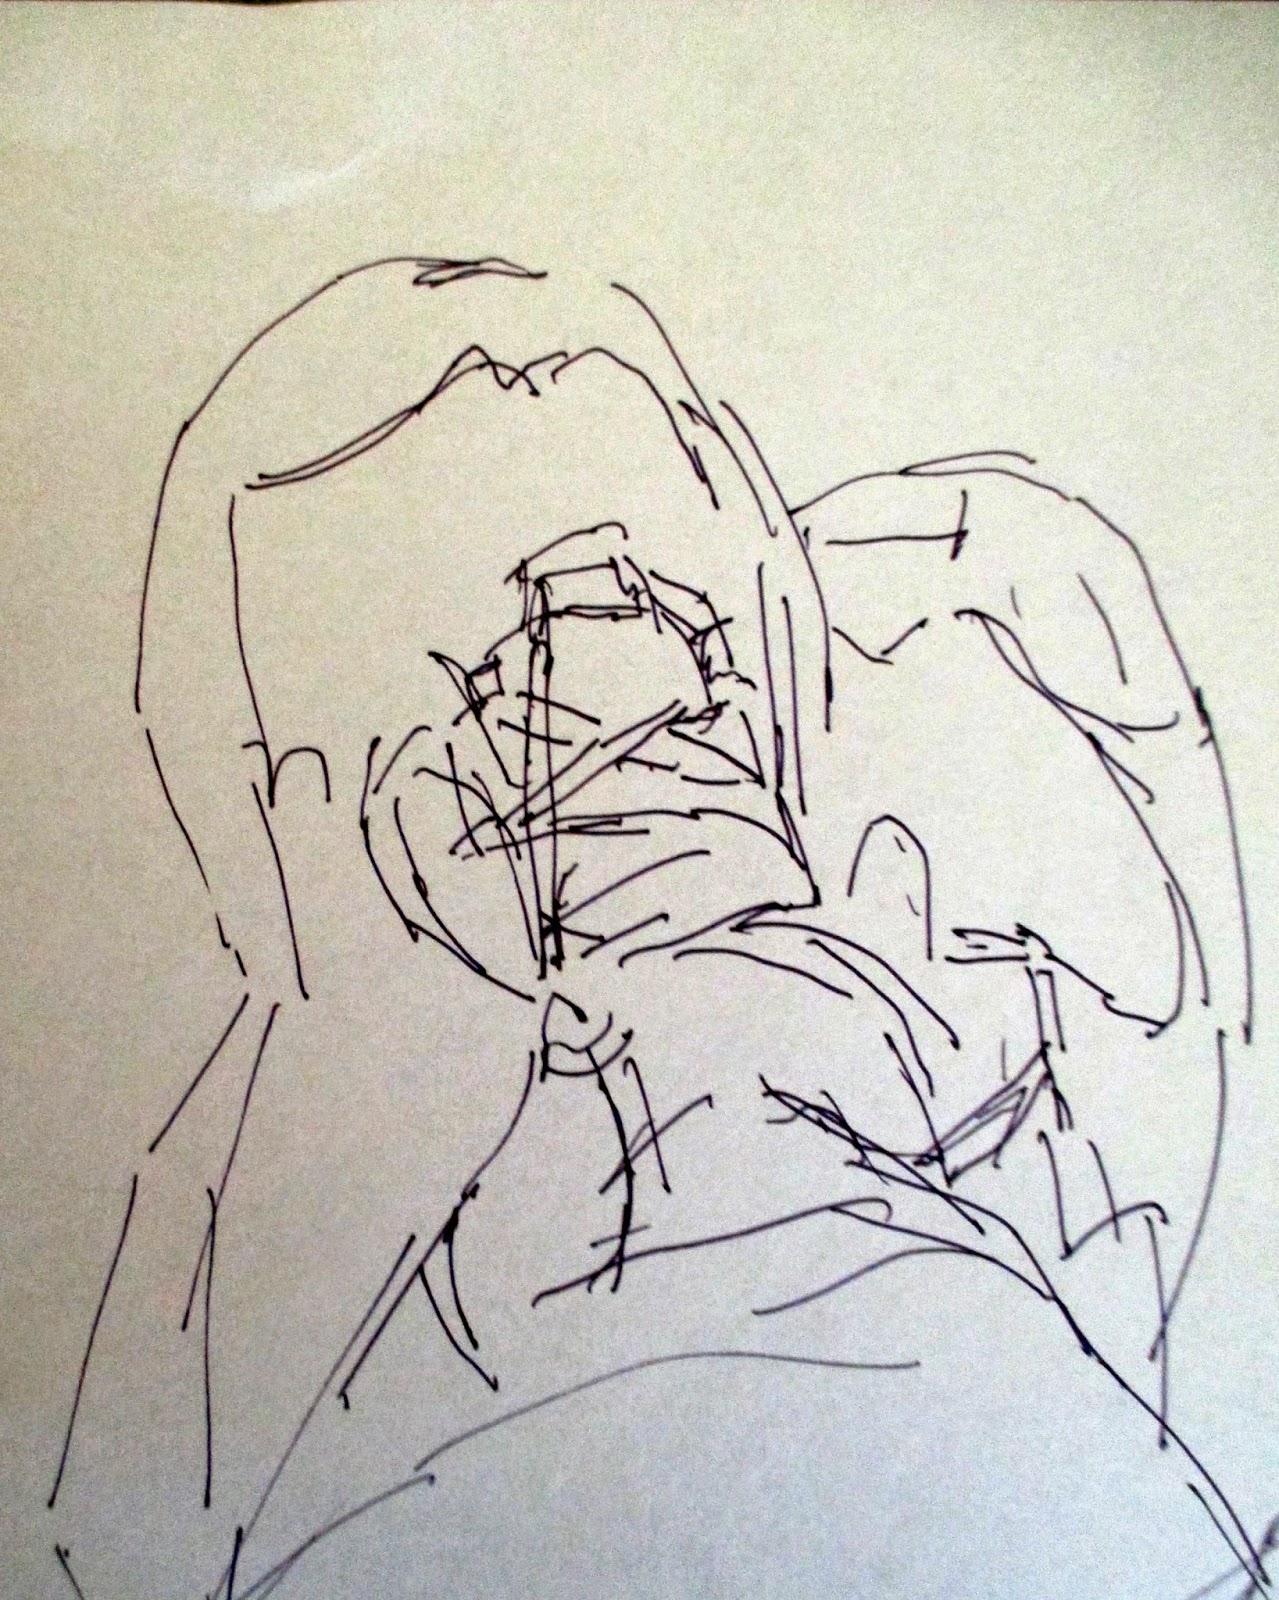 http://artbythebooks.blogspot.ca s.charto